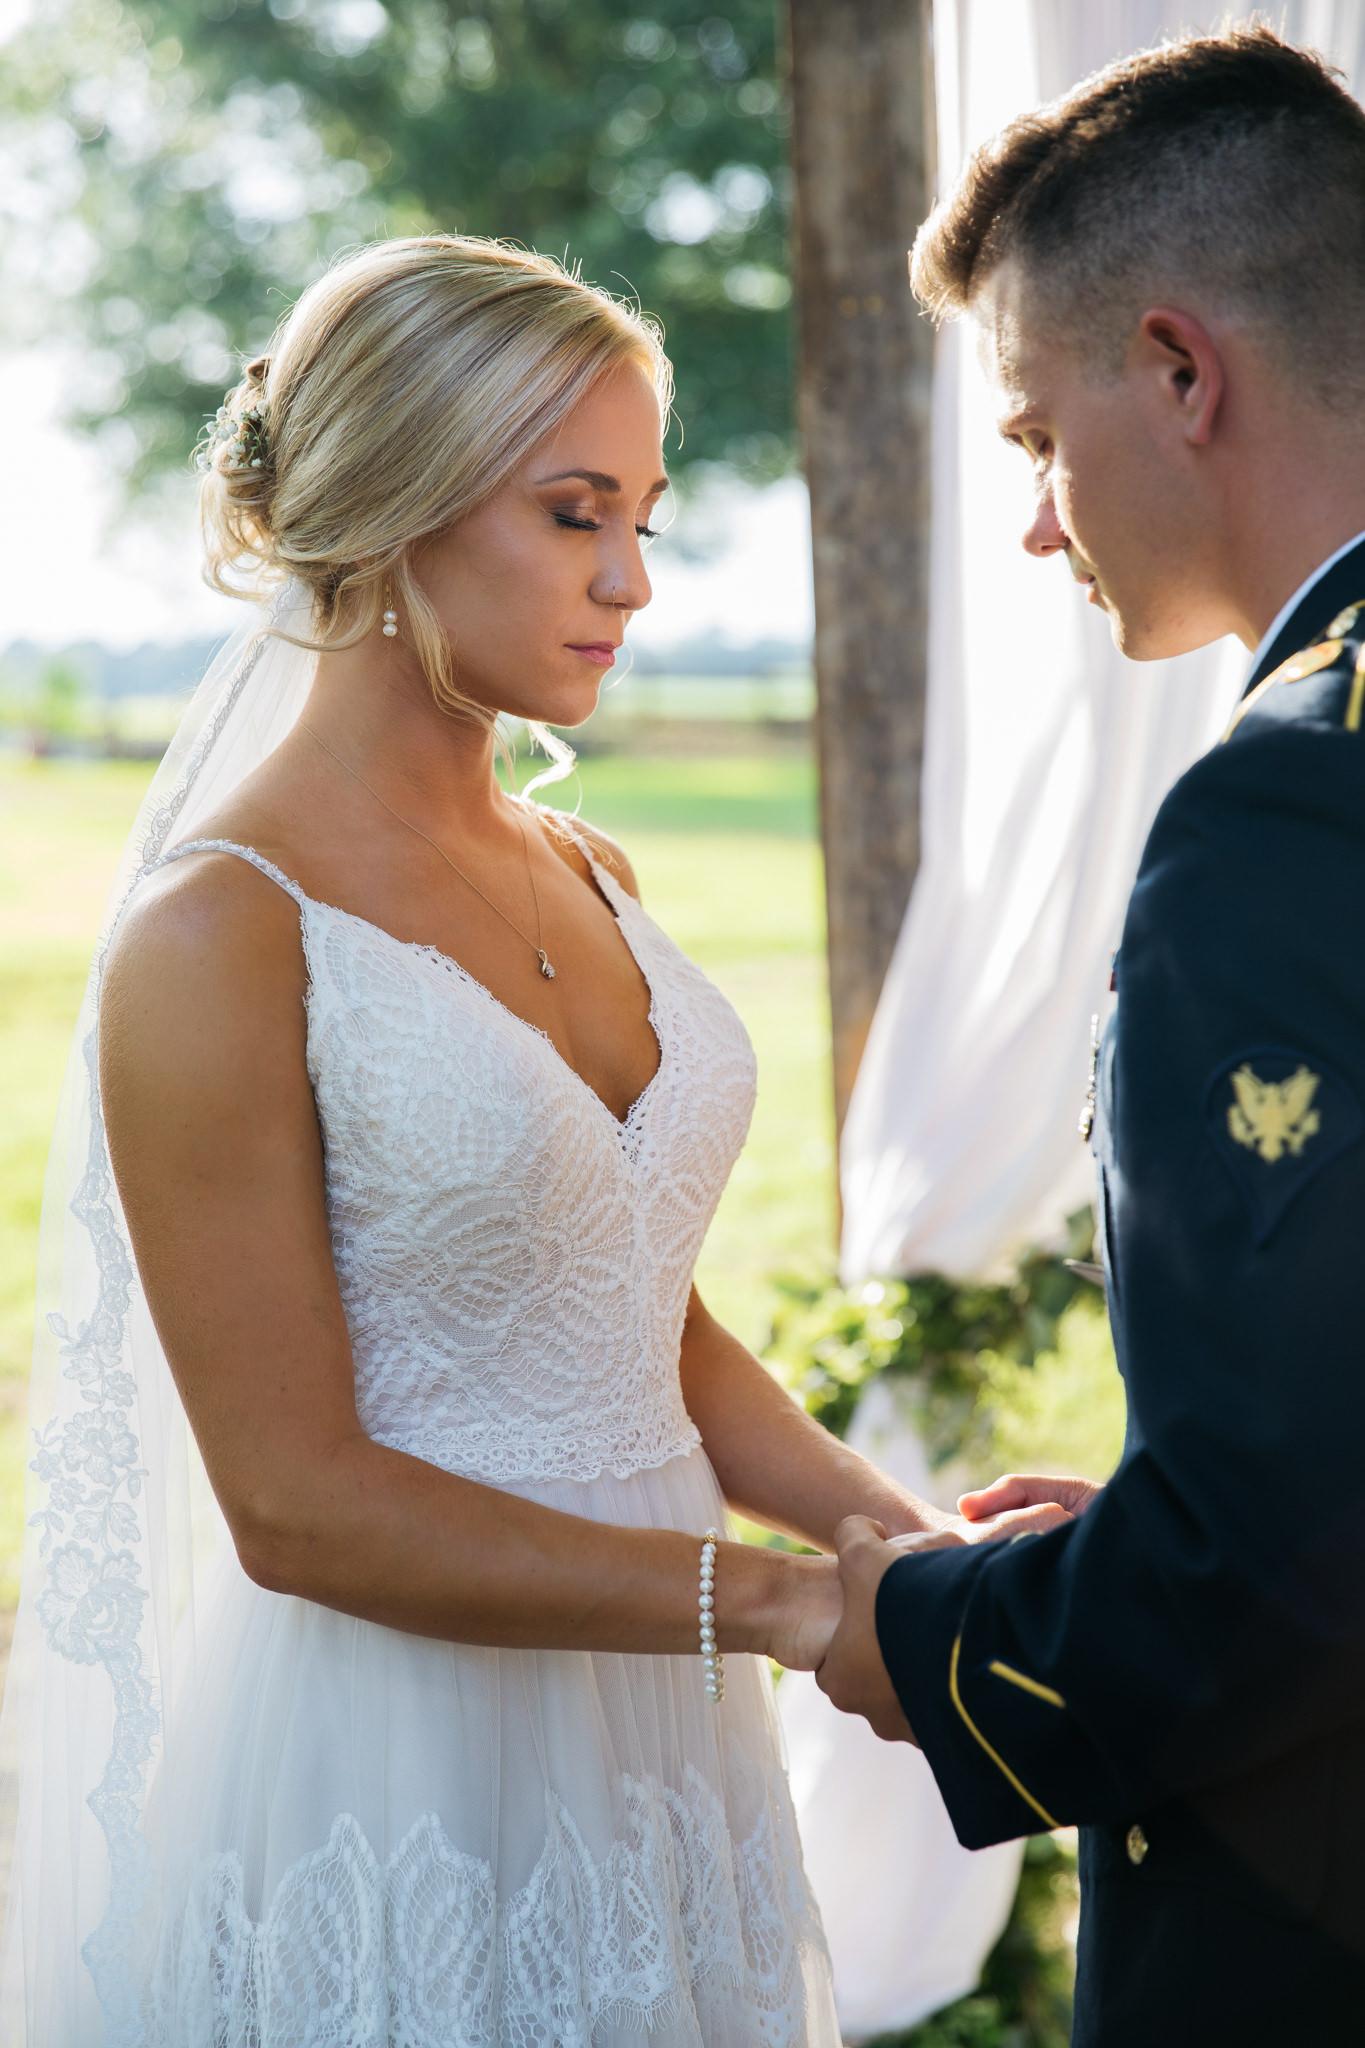 backyard-wedding-thewarmtharoundyou-lexy-branson-55.jpg